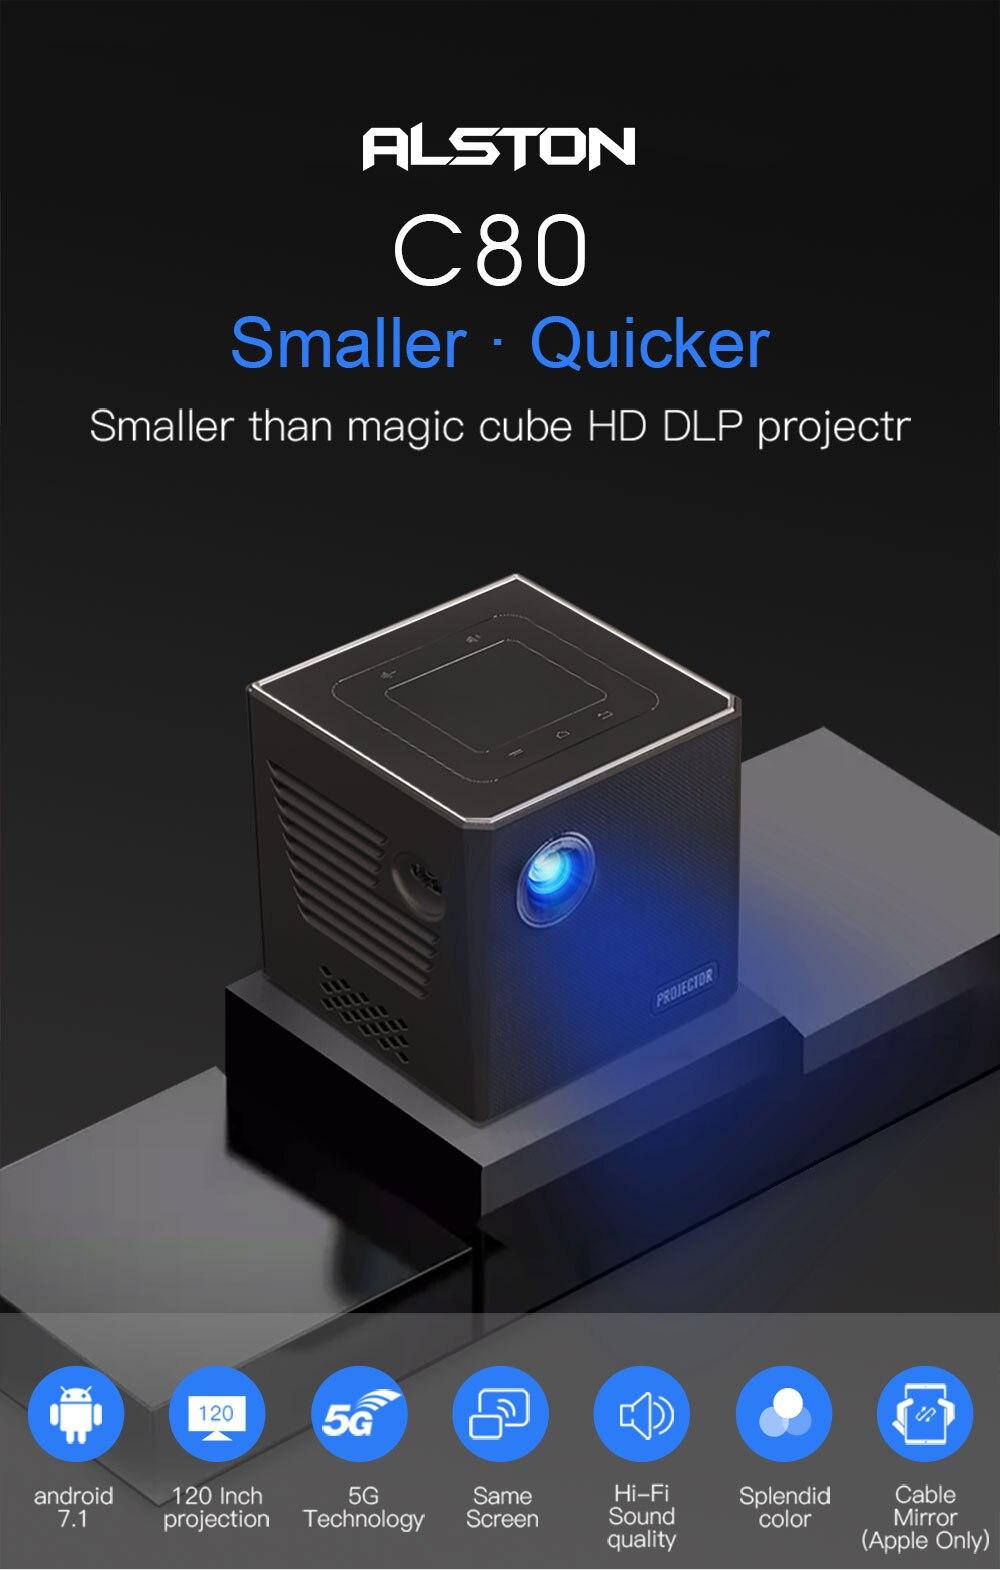 Alston c80 mini dlp android projetor wifi bluetooth 4.0 portátil led projetor de vídeo cinema em casa apoio miracast airplay-1